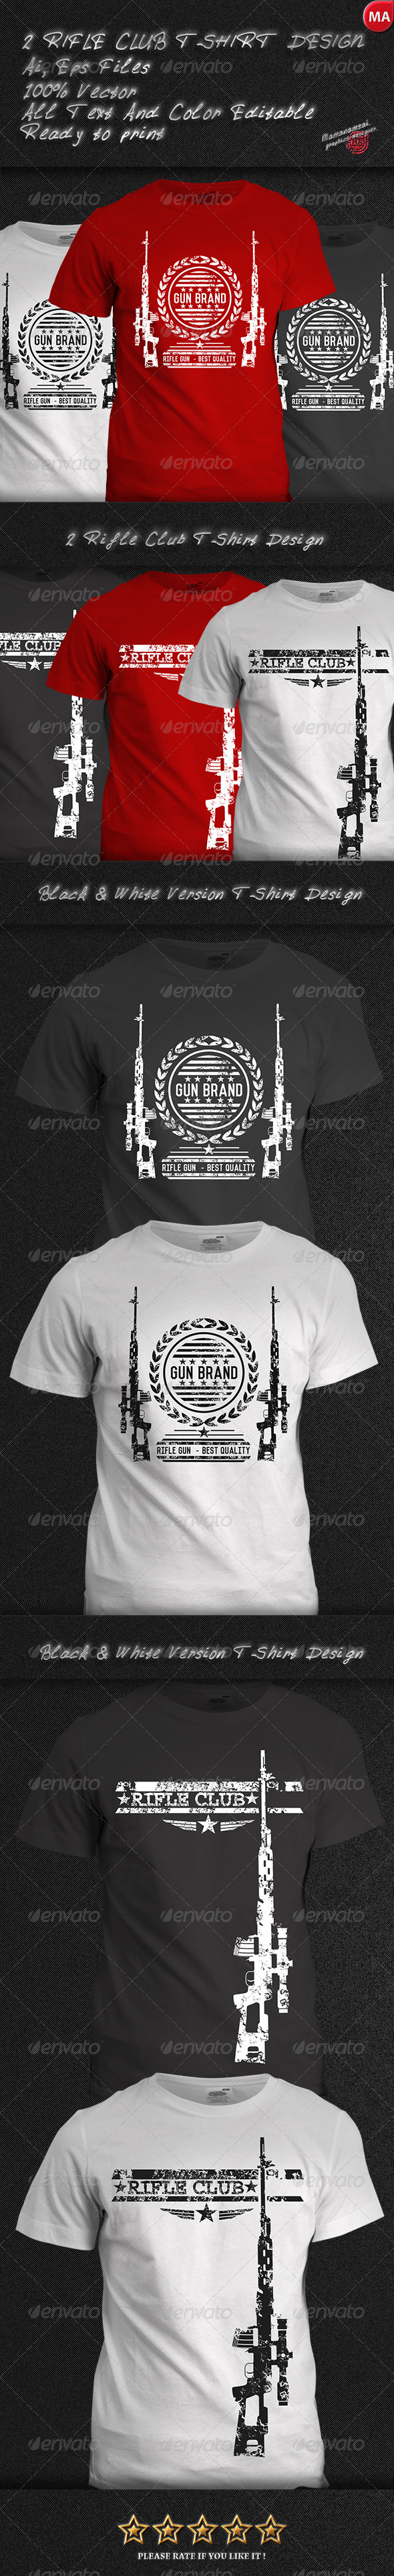 GraphicRiver 2 Rifle Club T-Shirt Design 7772245